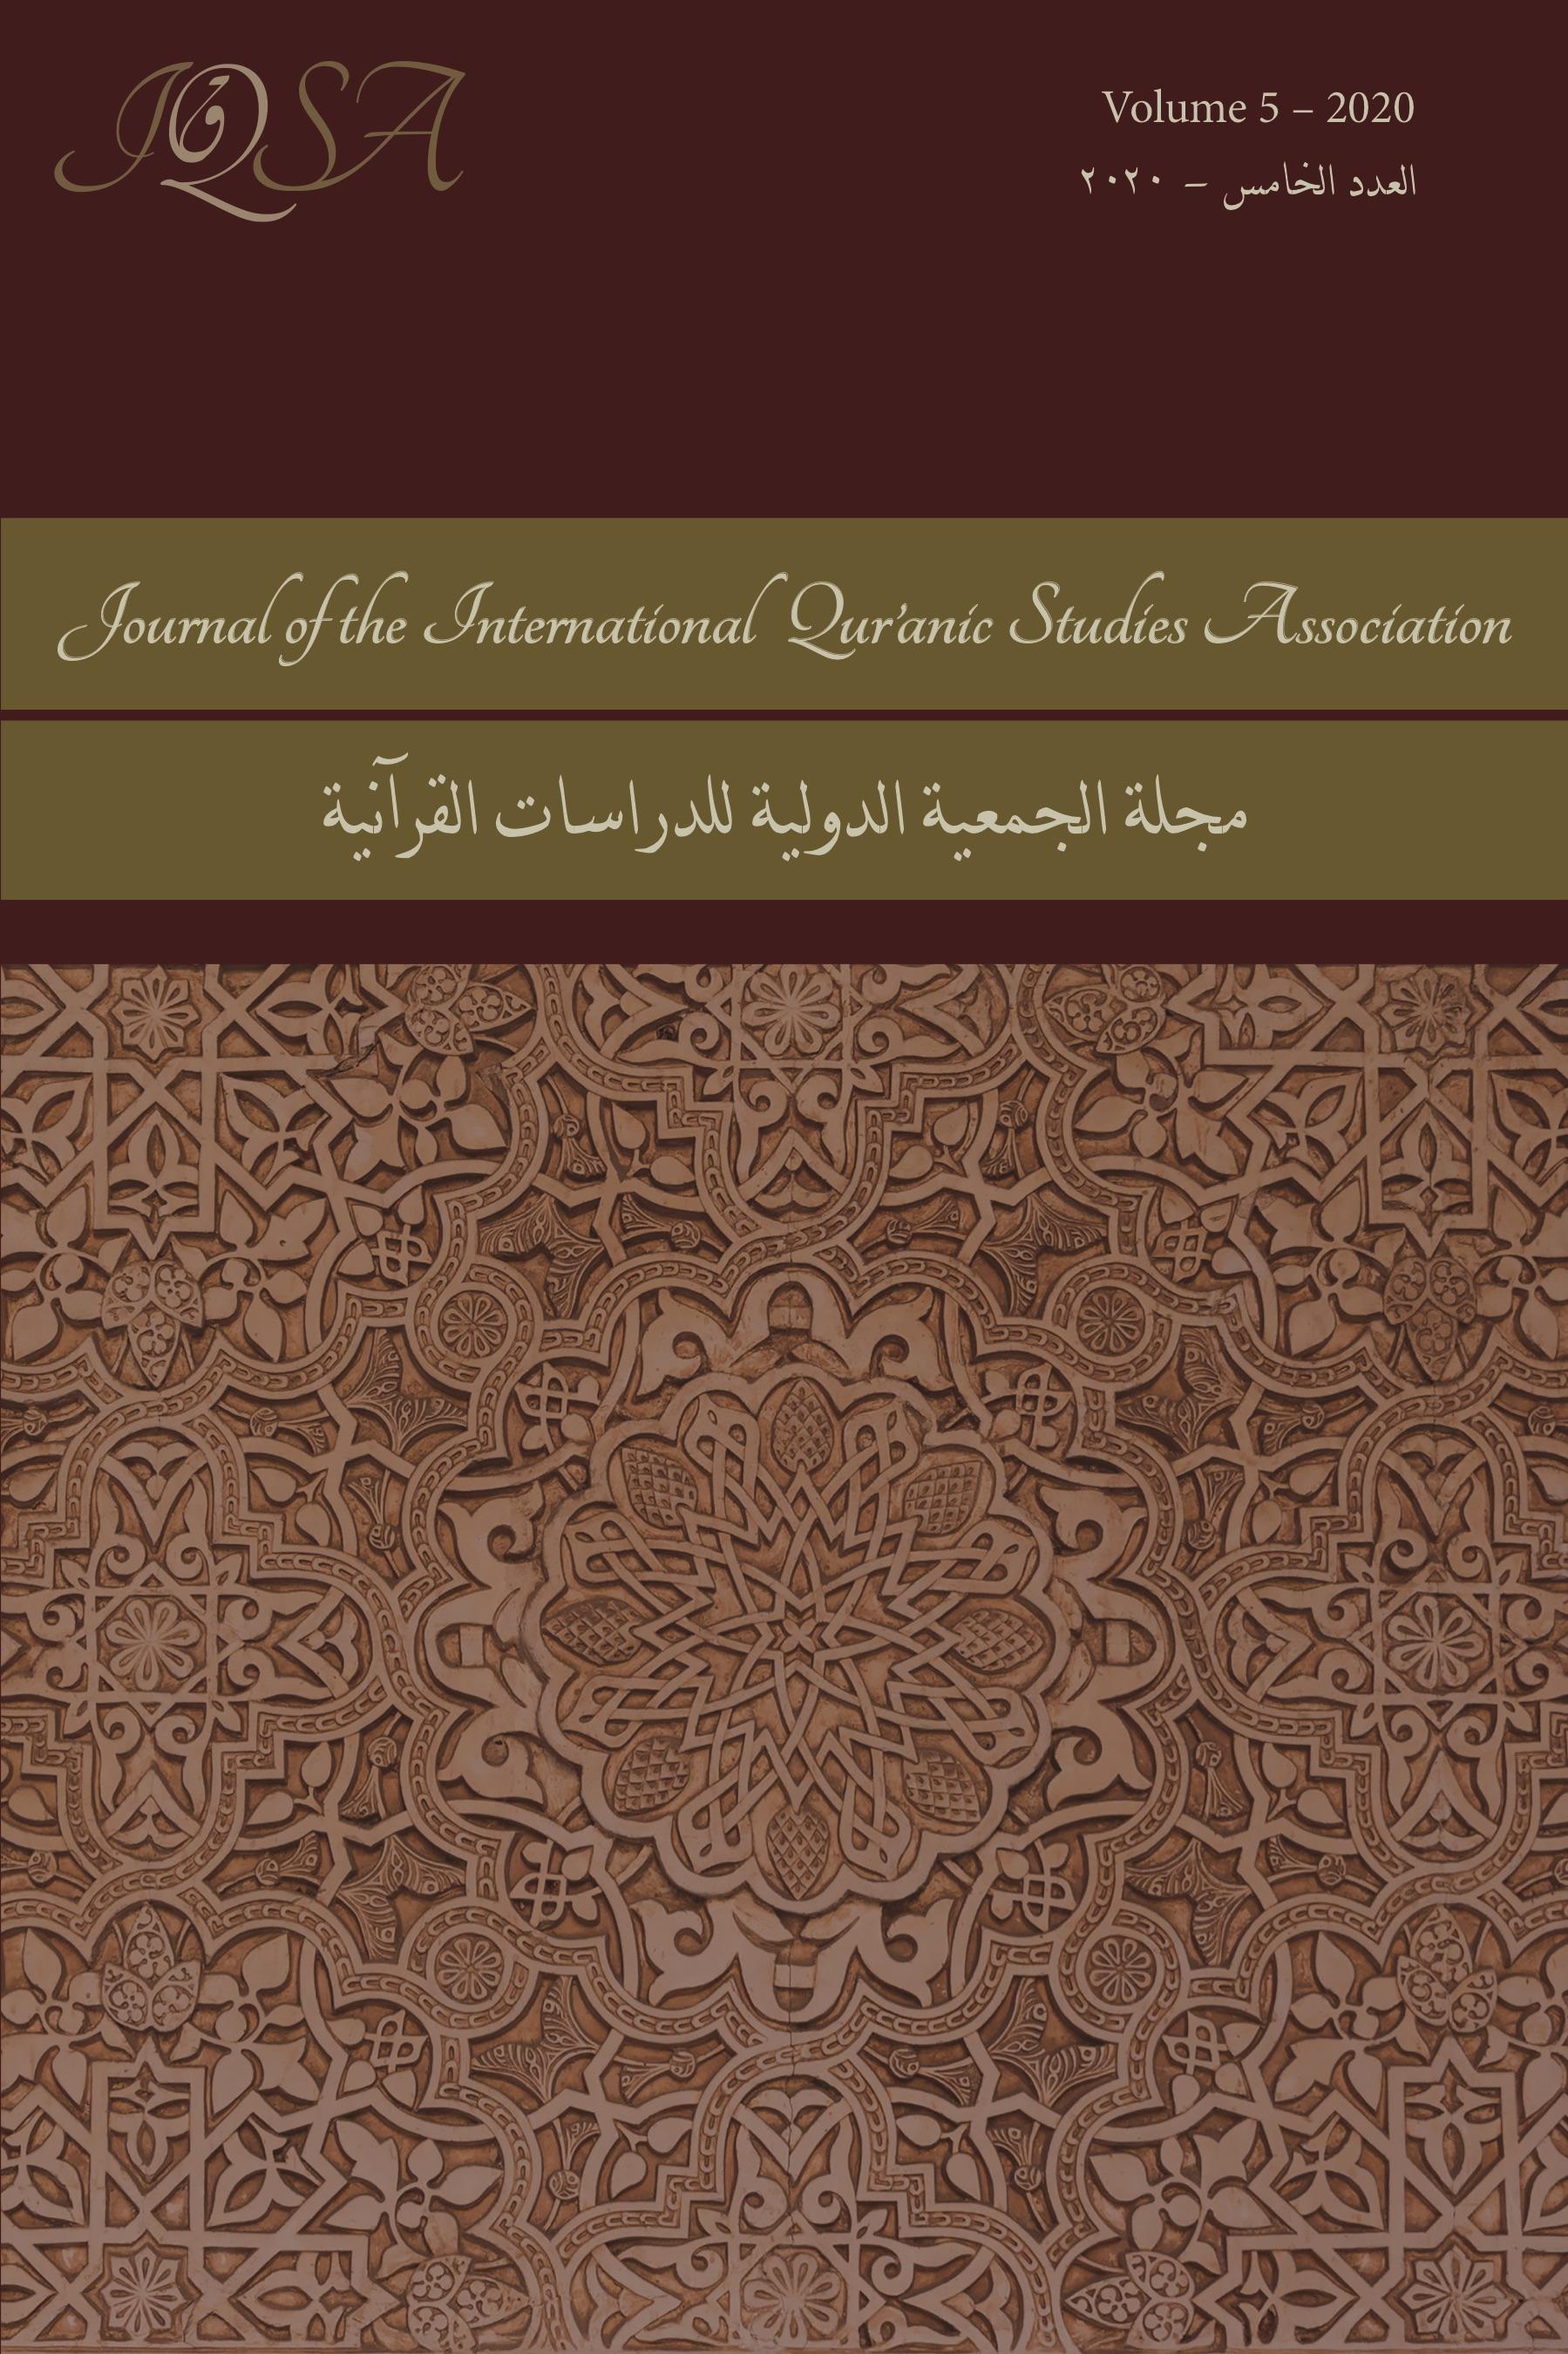 Cover for JIQSA vol. 5